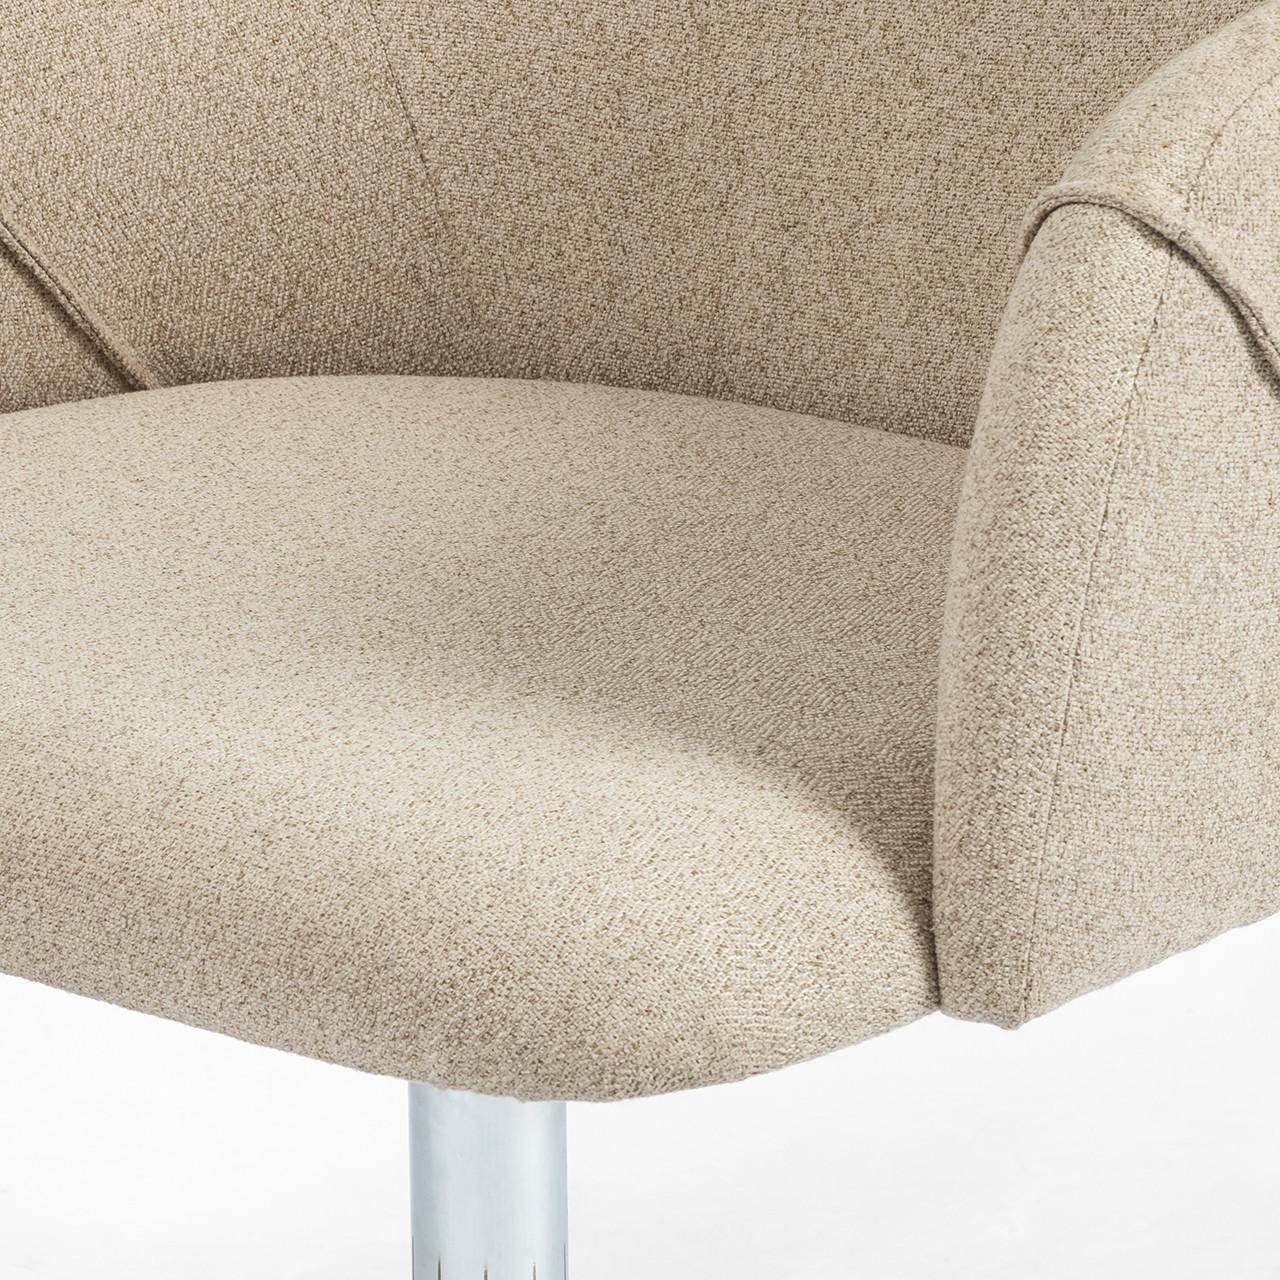 Edna Desk Chair - Fedora Oatmeal